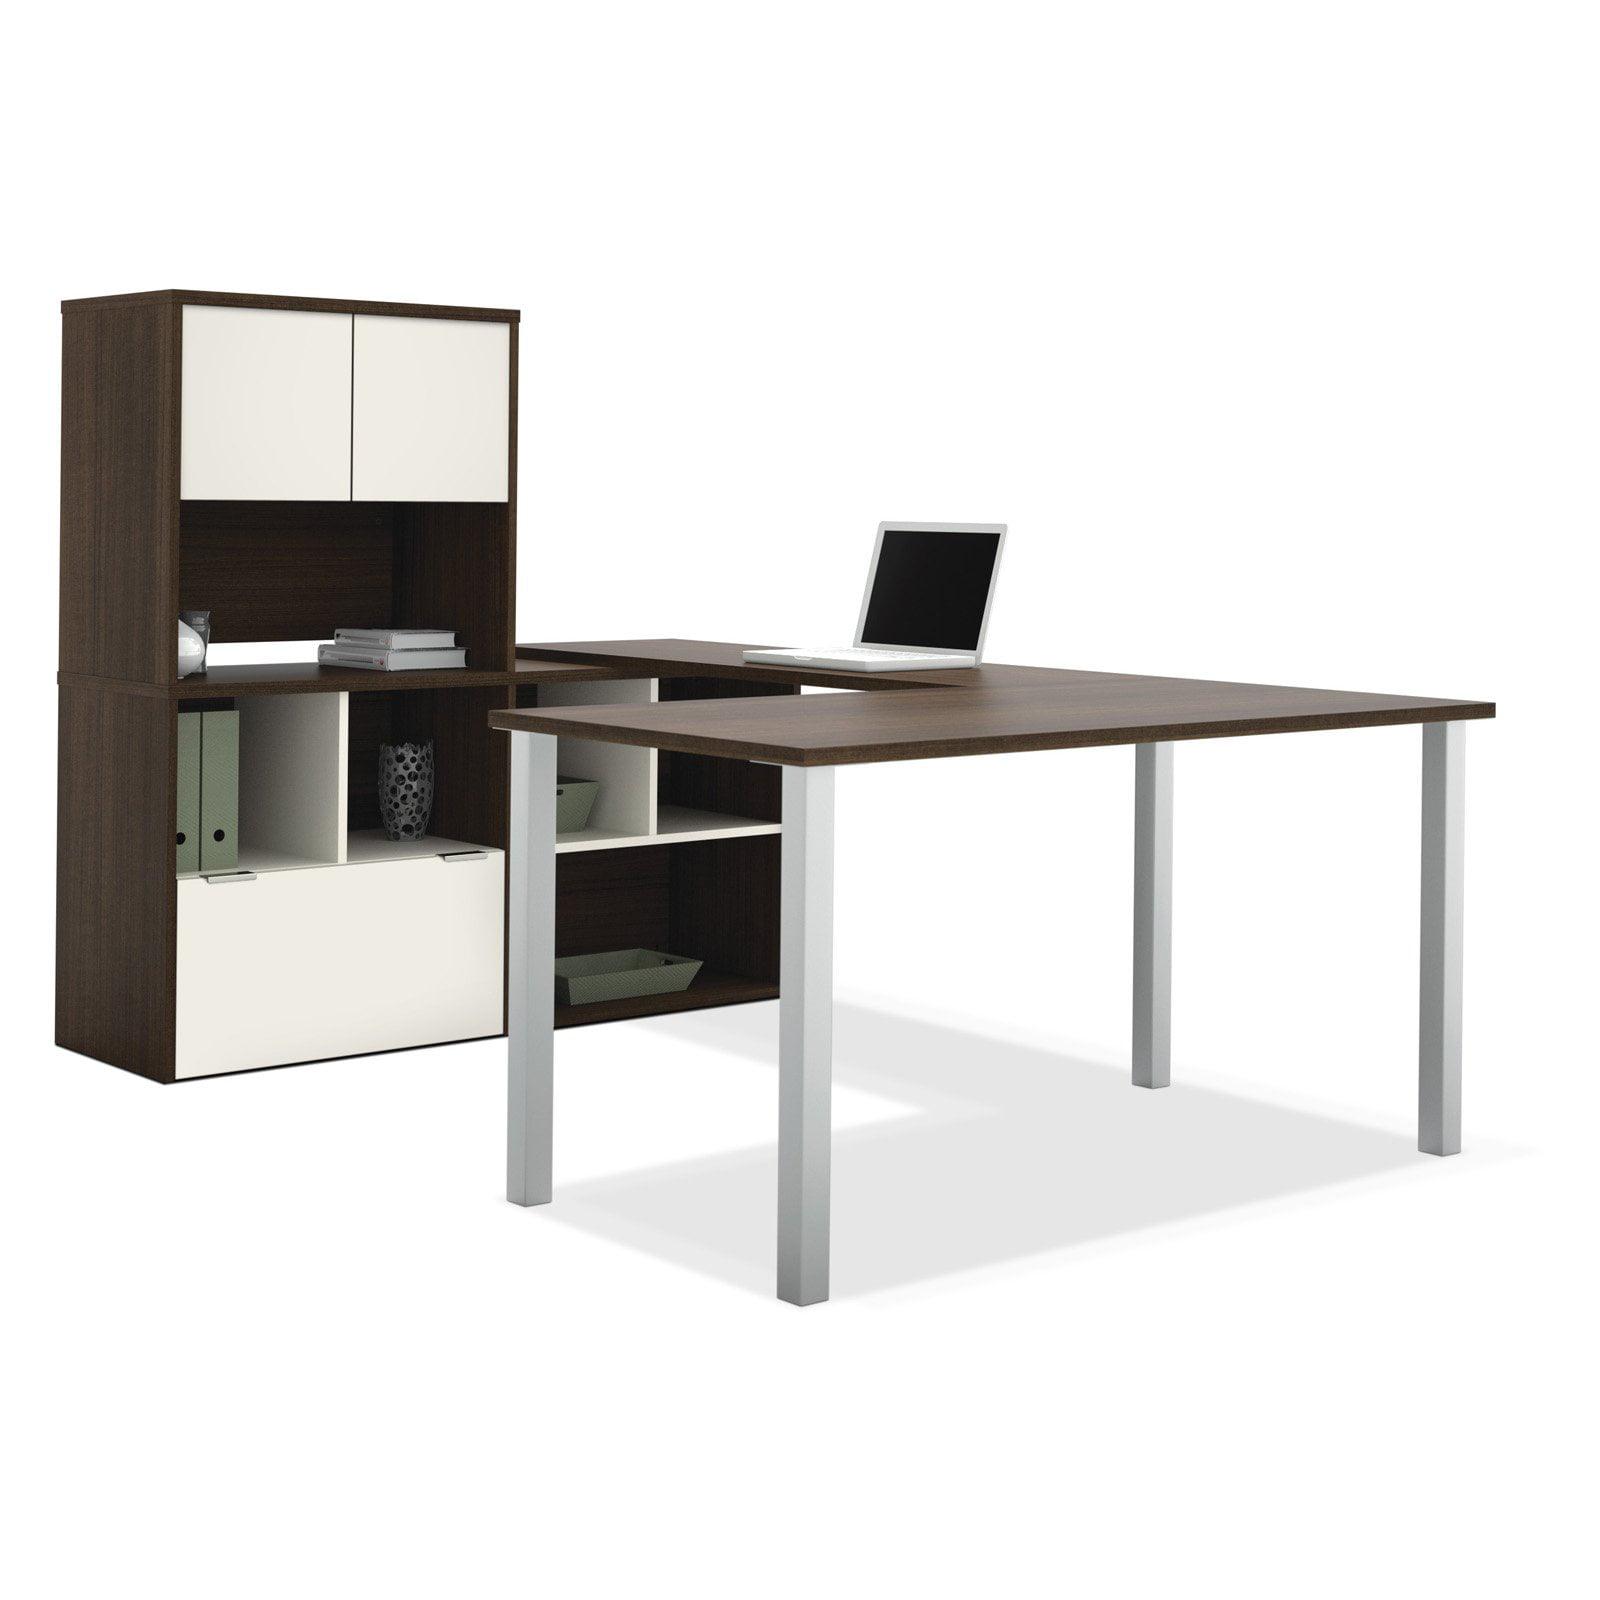 Bestar 50851-60 Contempo U-Shaped Desk with Storage Unit - Tuxedo / Sandstone